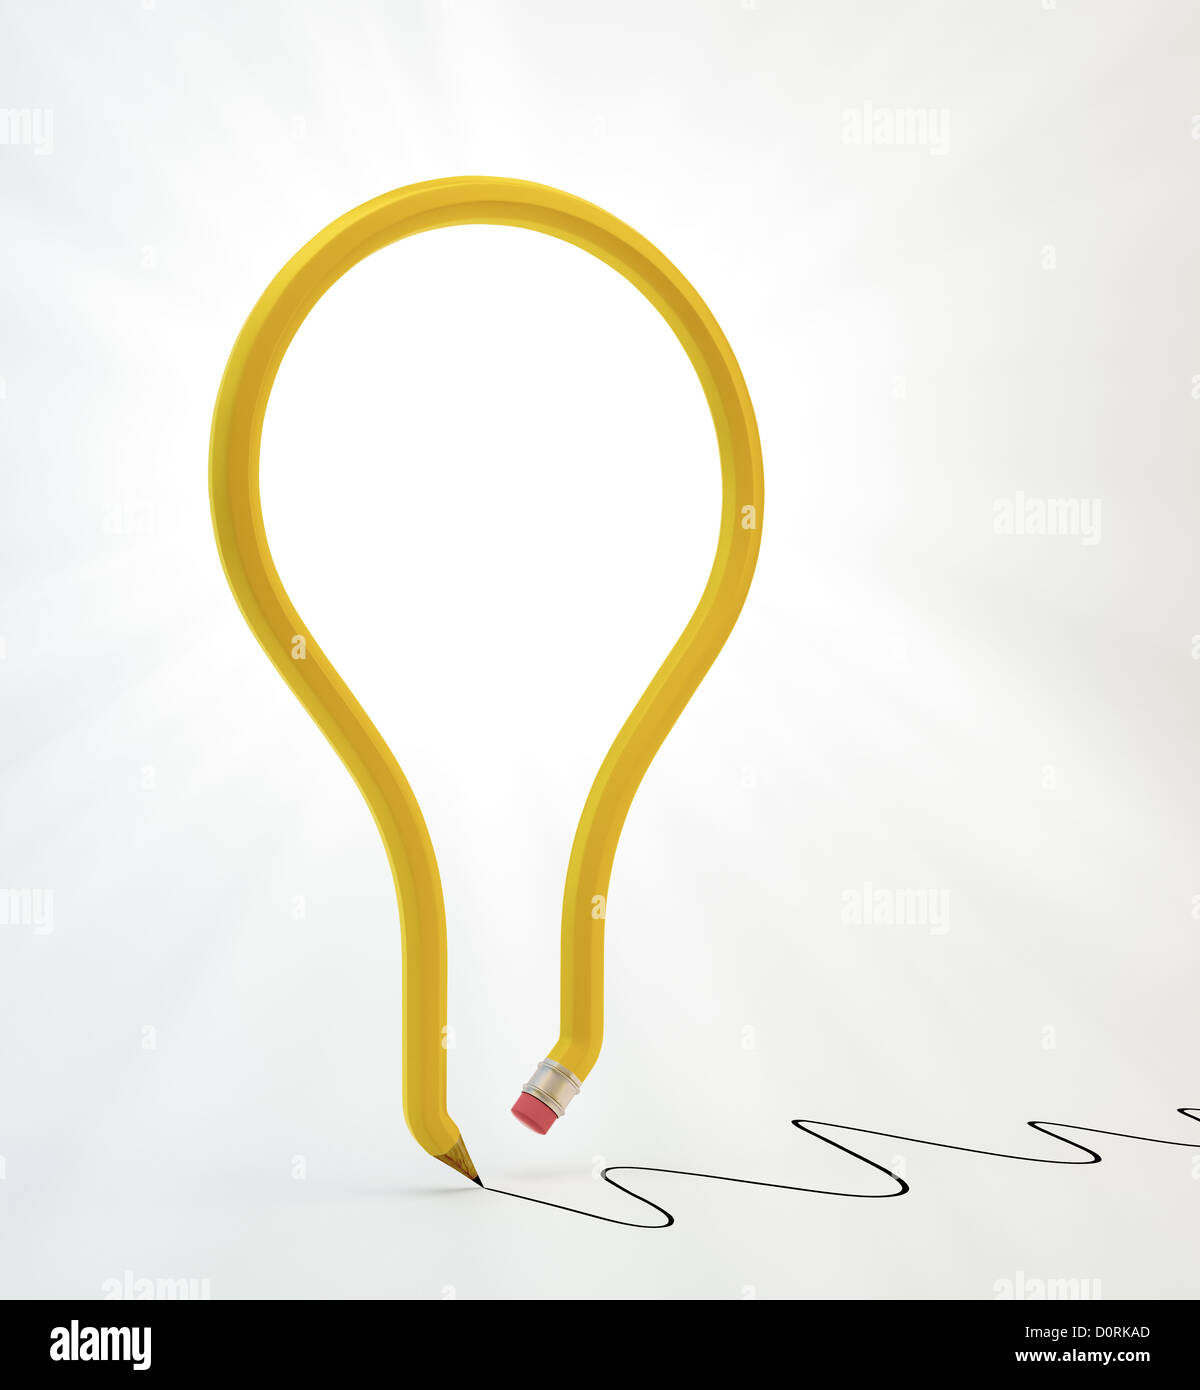 Bombilla de luz lápiz Imagen De Stock